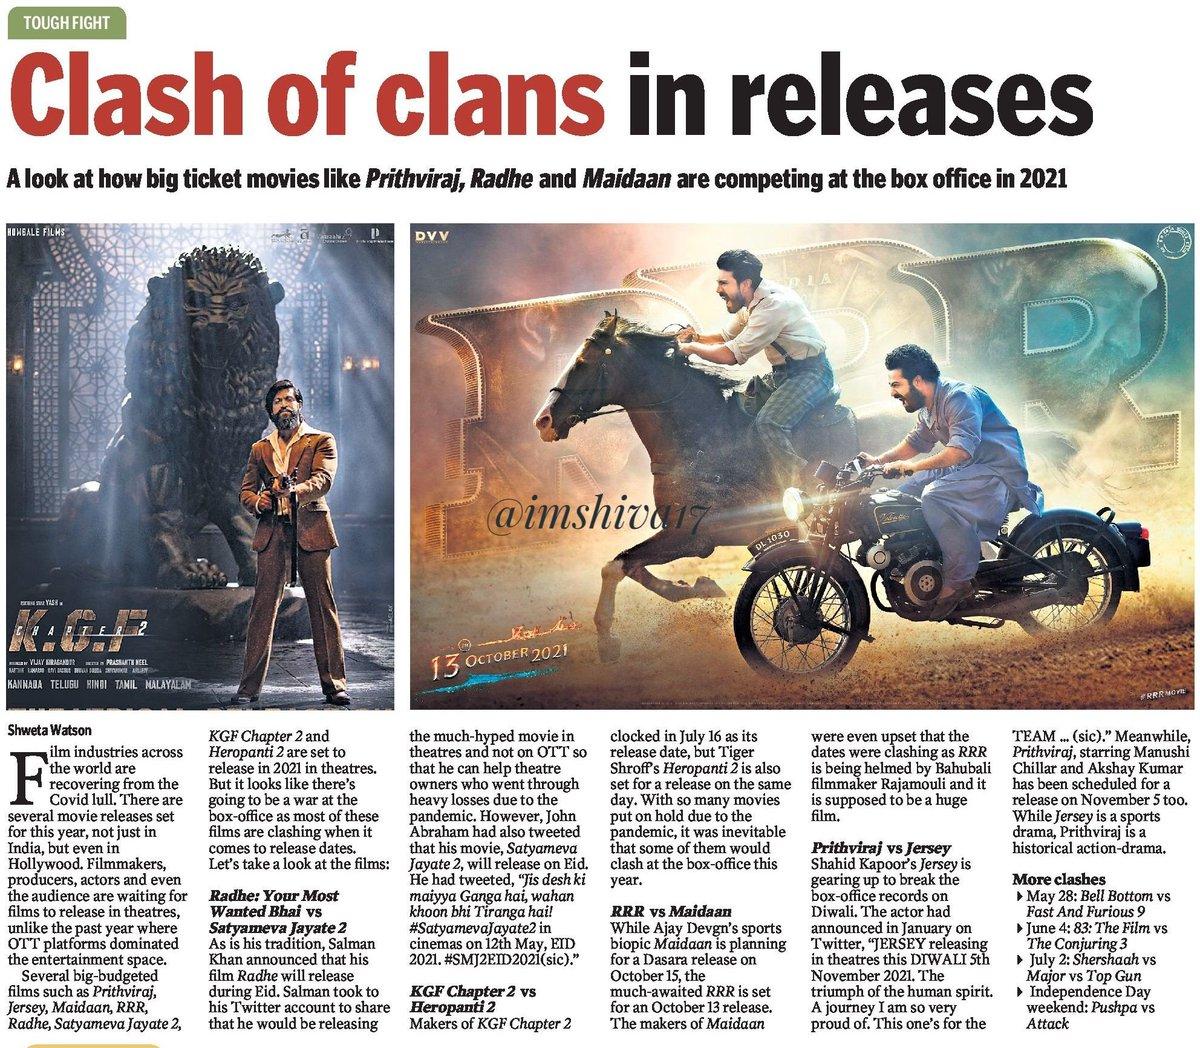 CLASH OF CLANS IN RELEASES   Bollywood's biggies getting ready  for Friday clashes   #KGF2 , #RRR , #GangubaiKathiawadi , #RadheShyam , #Prithviraj  #Maidaan , #Radhe , #Jersey  #MumbaiSaga , #Shershaah  #Major , #SandeepAurPinkyFaraar , #SatyamevaJayate2